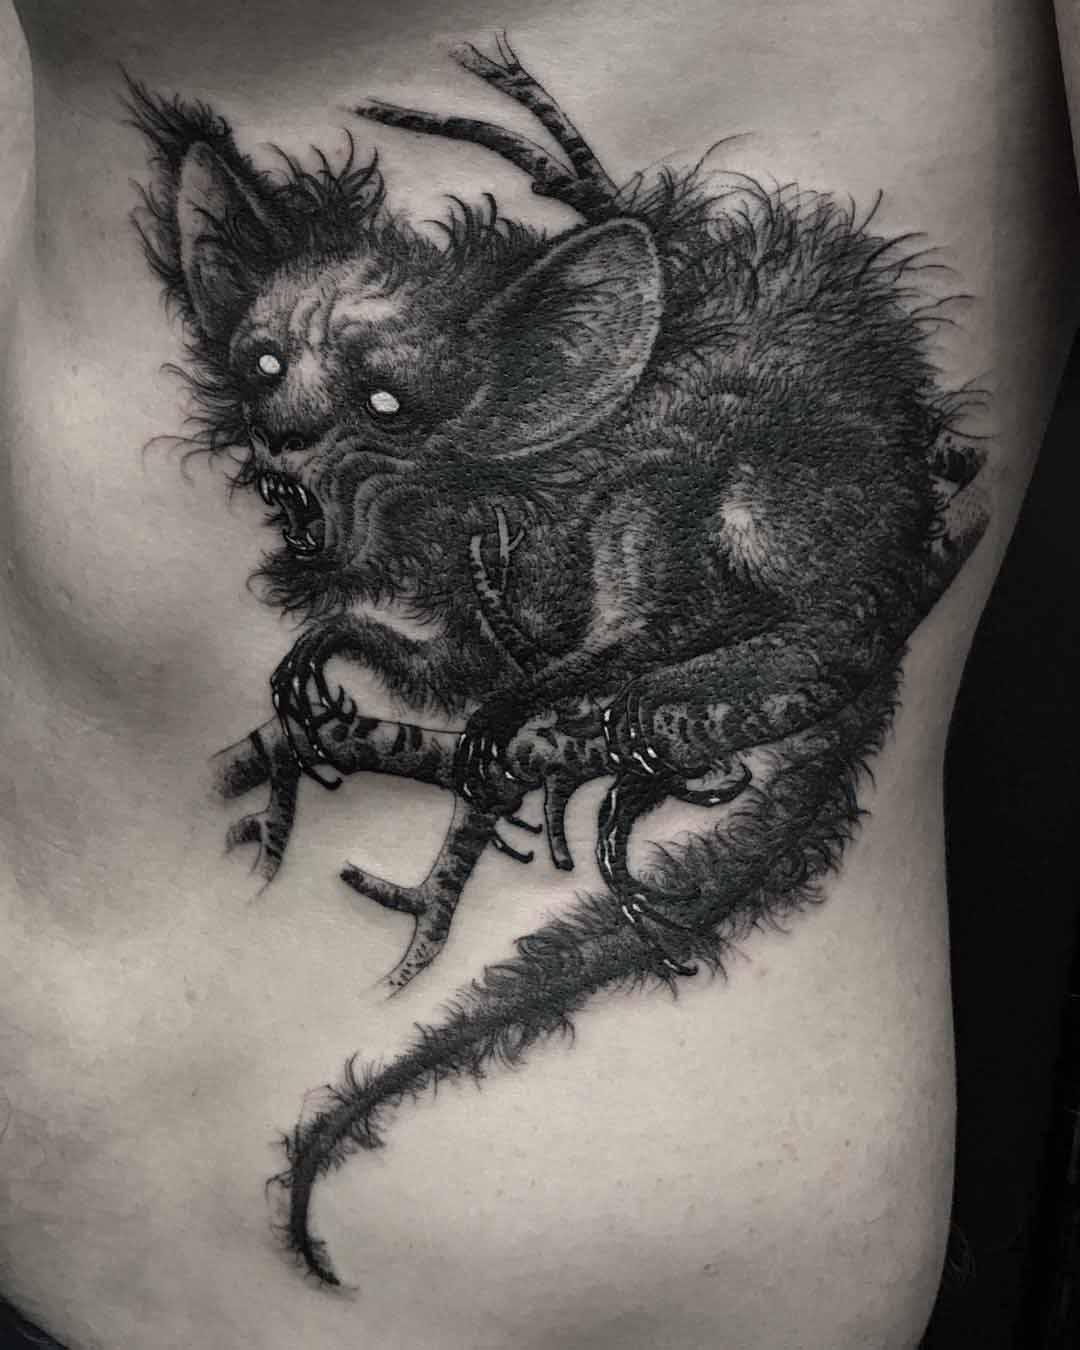 rib tattoo chupacabra monster